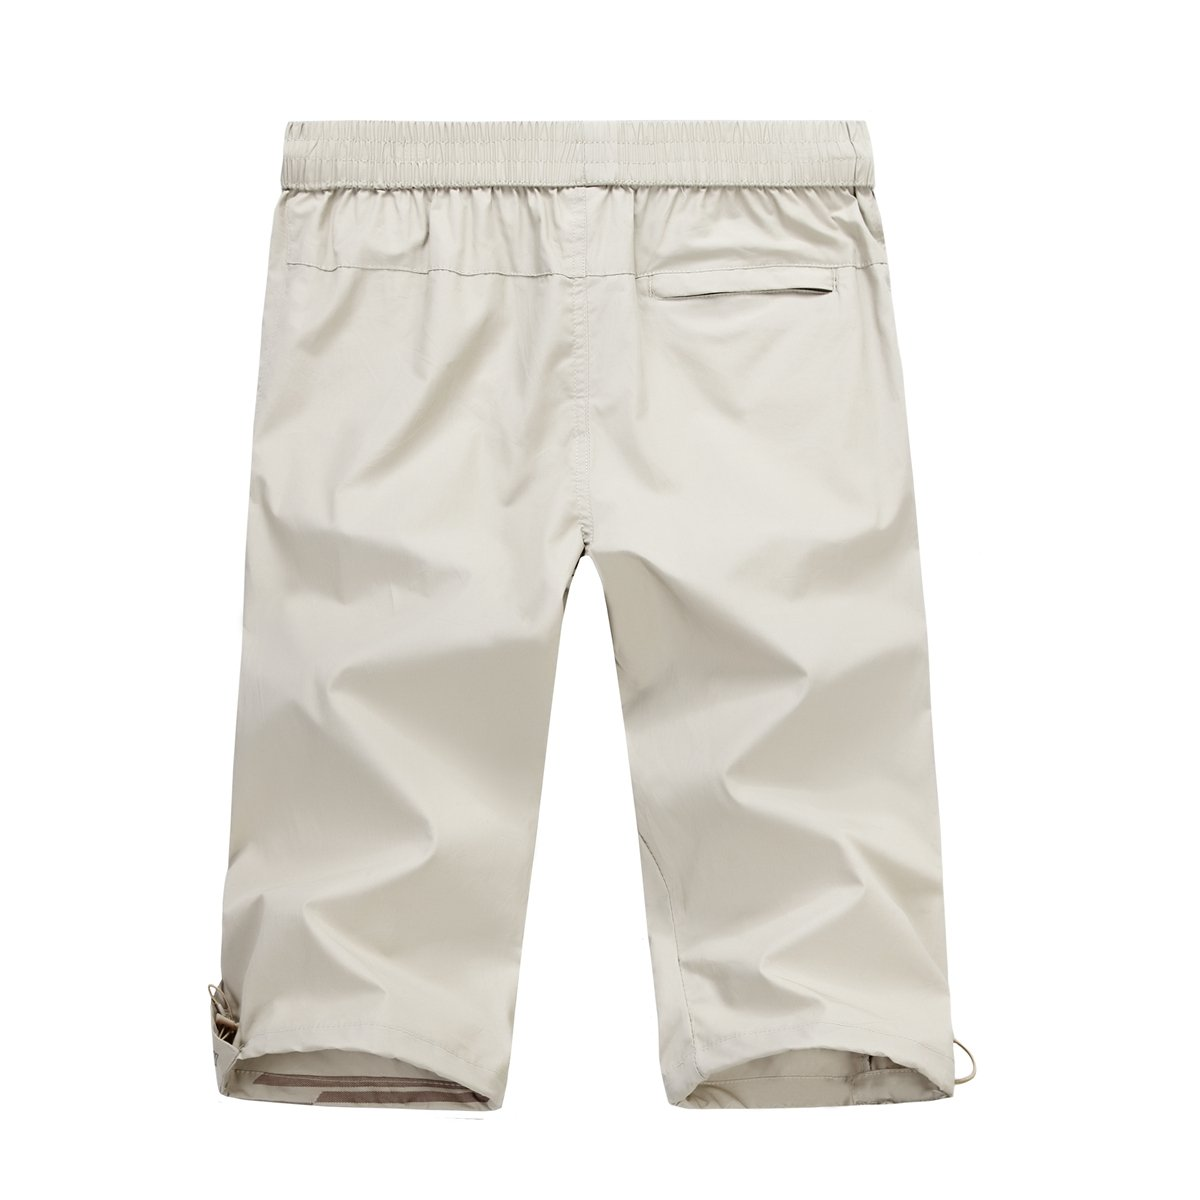 LAPLBEKE Jungen Shorts 3//4 Kurze Hose Kinder Bermuda Capri Sommer Shorts